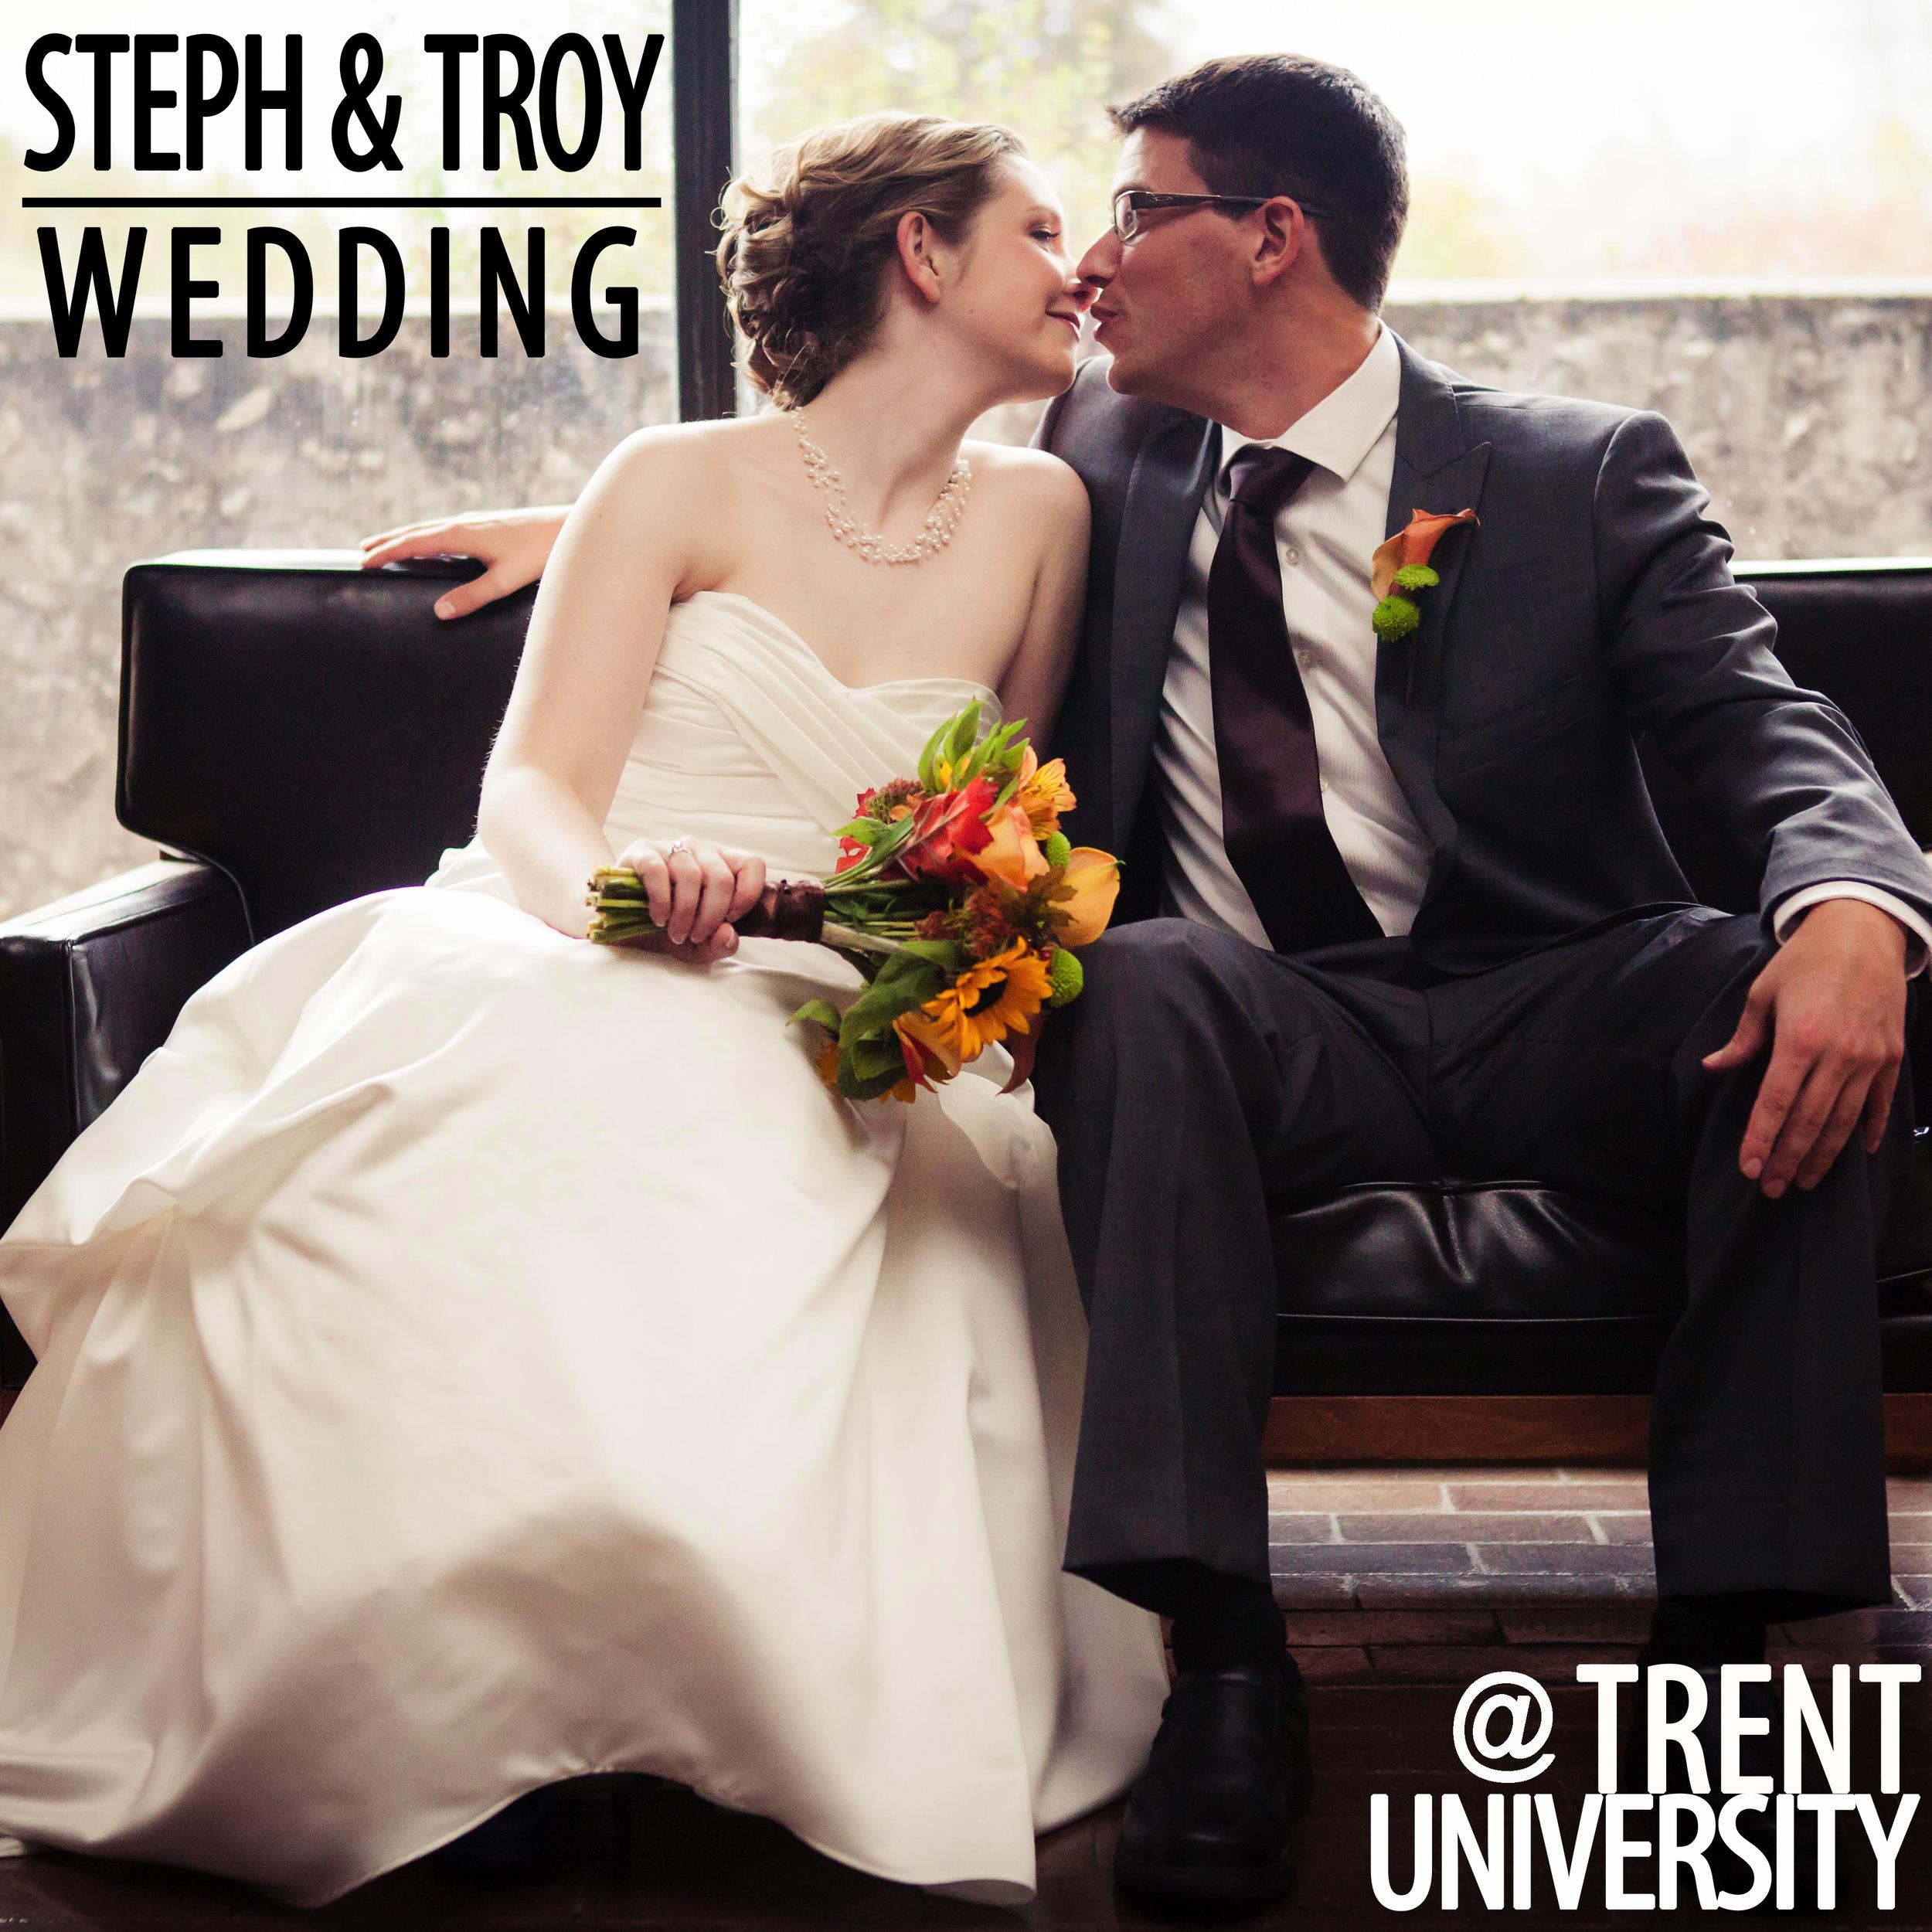 toronto_wedding_photography-Steph_Troy-1.jpg